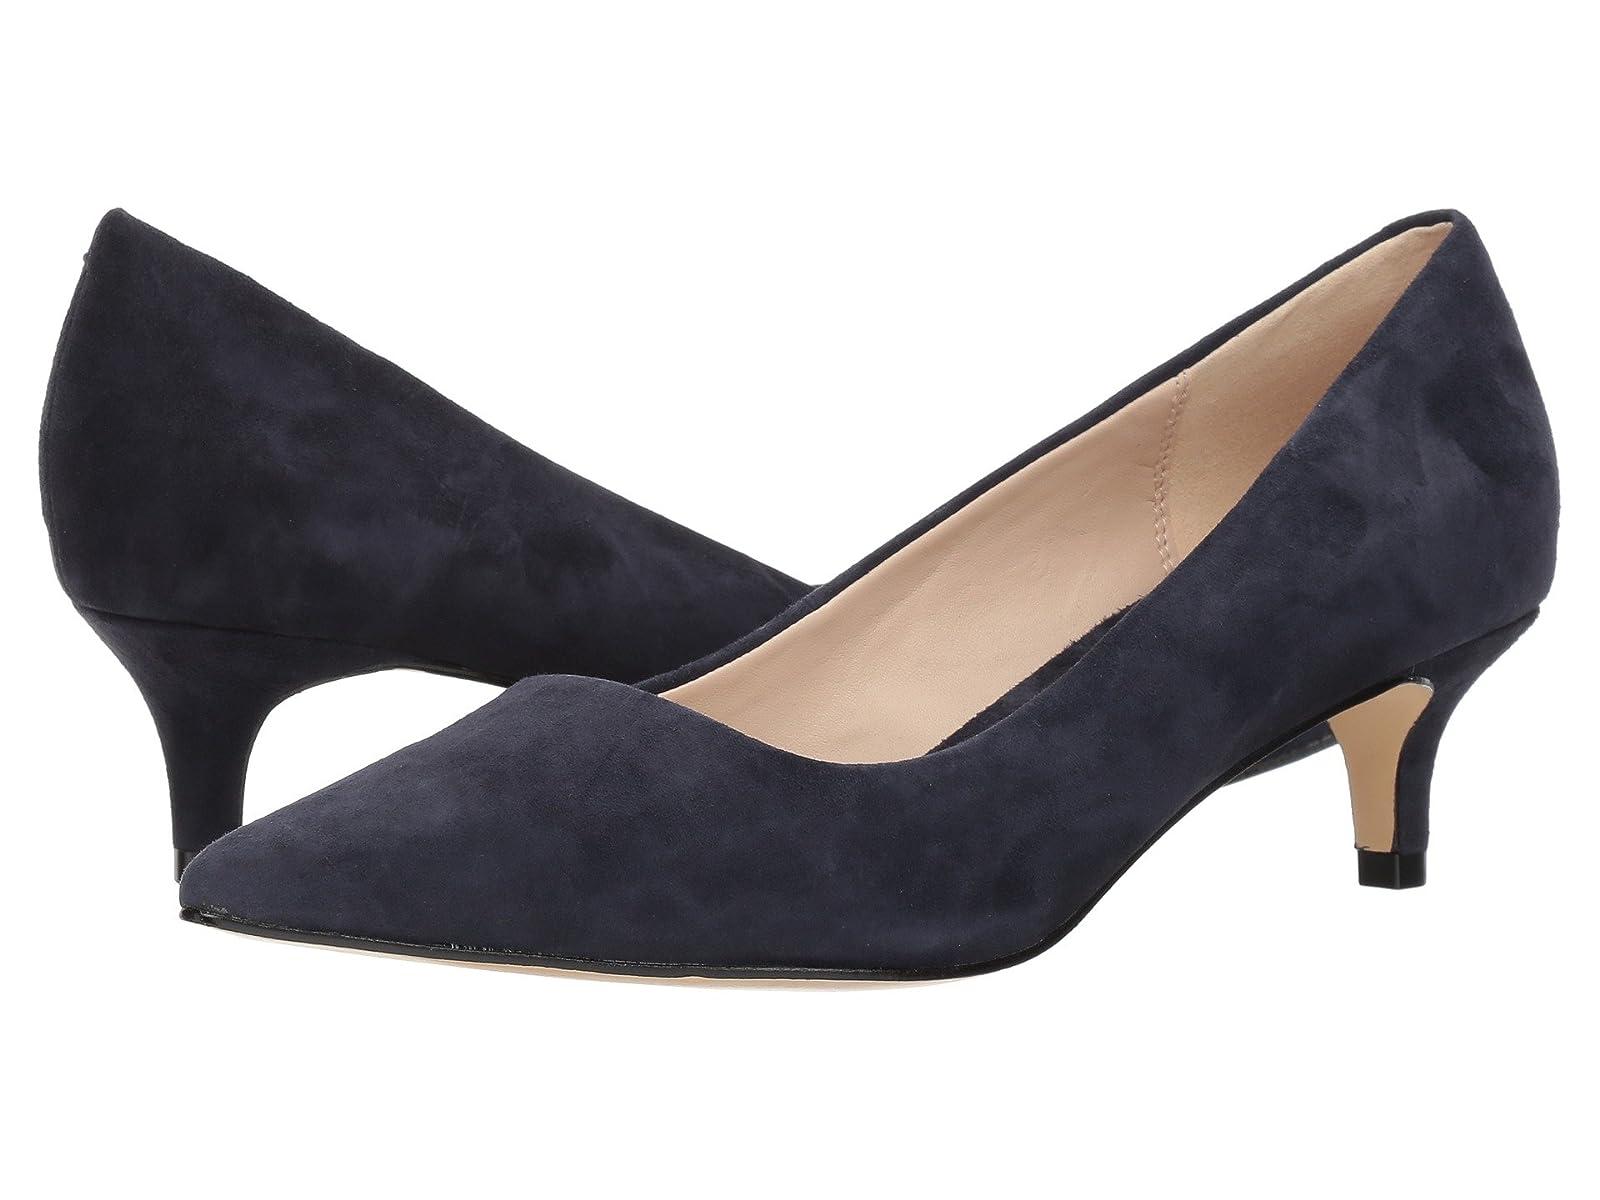 Pelle Moda DenaCheap and distinctive eye-catching shoes